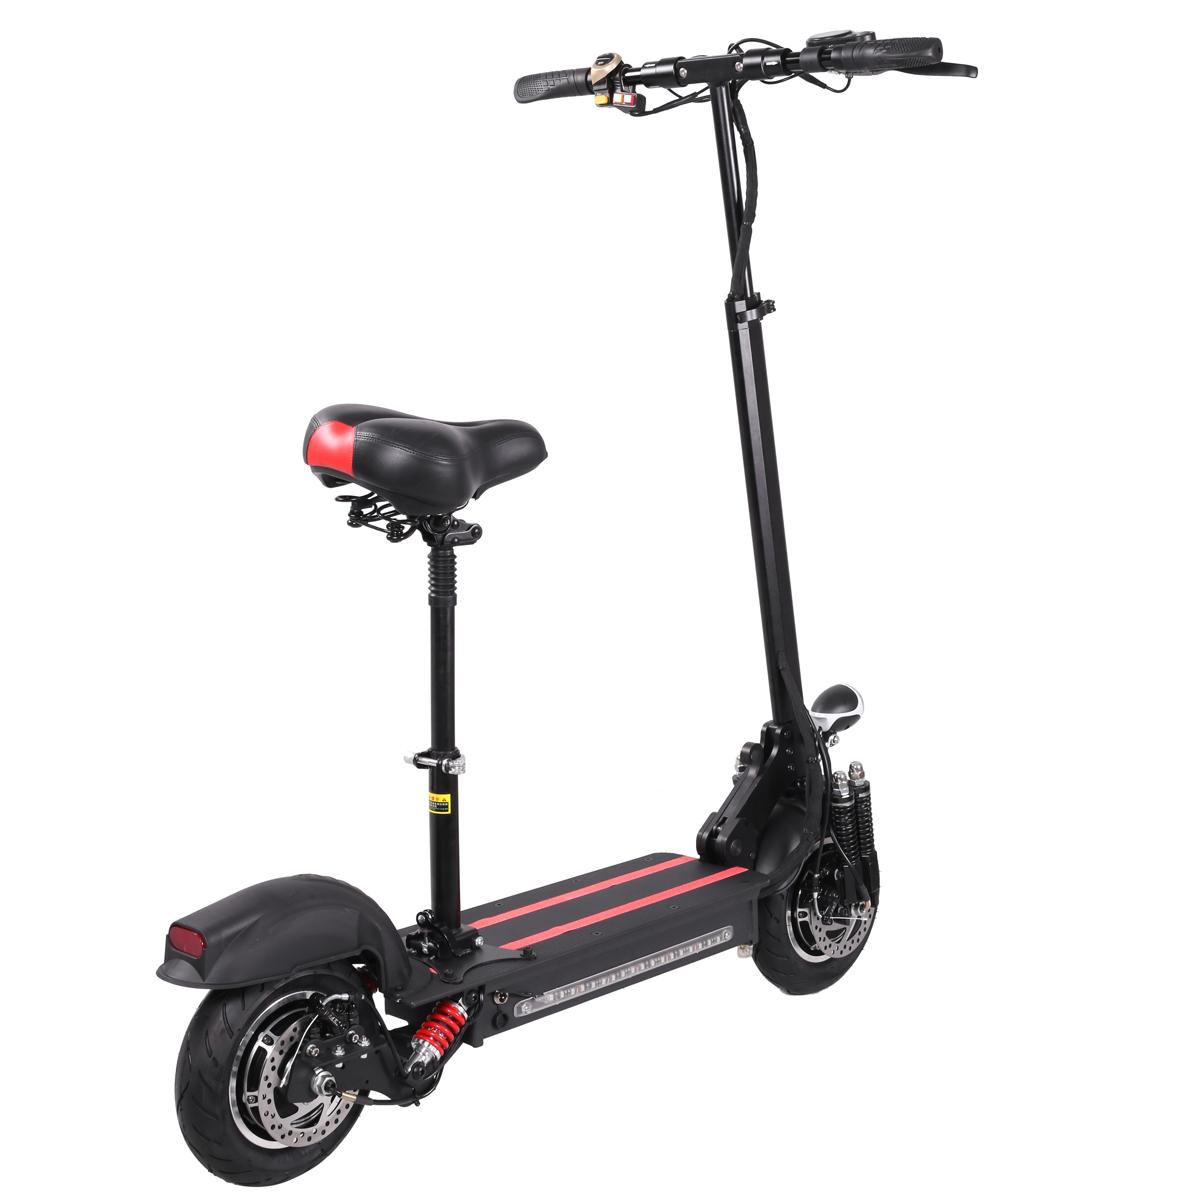 World Popular Direct Manufacturer lowest price 2000w 60V fast electric scooter China, White;black;blue;golden or oem